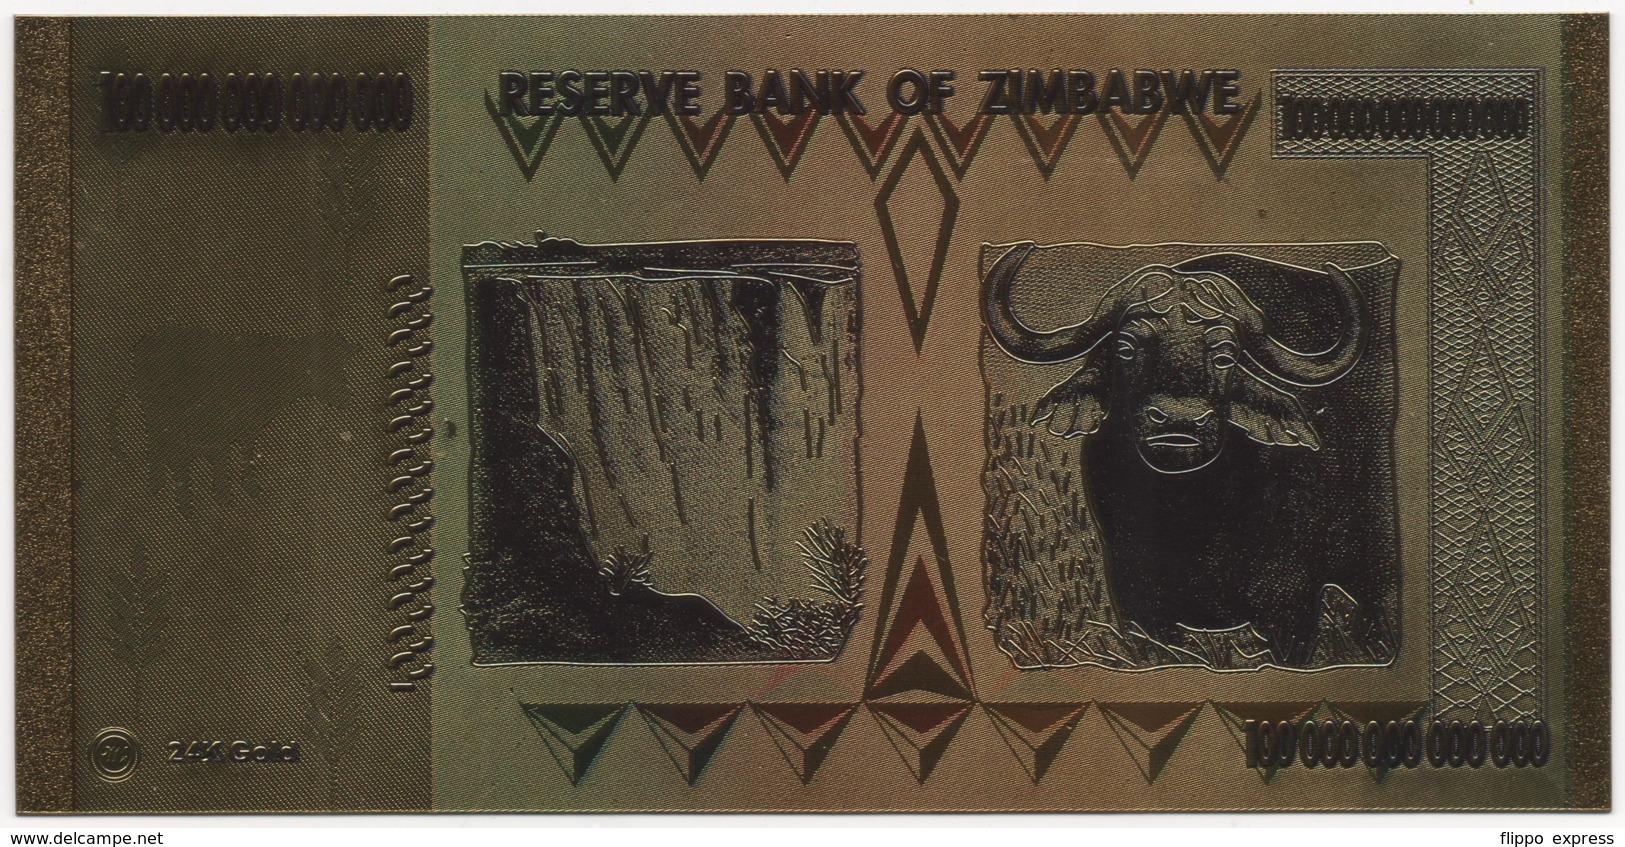 Zimbabwe, 100 Trillion Dollars, 24K Gold-Plated, Colored Banknote - Zimbabwe